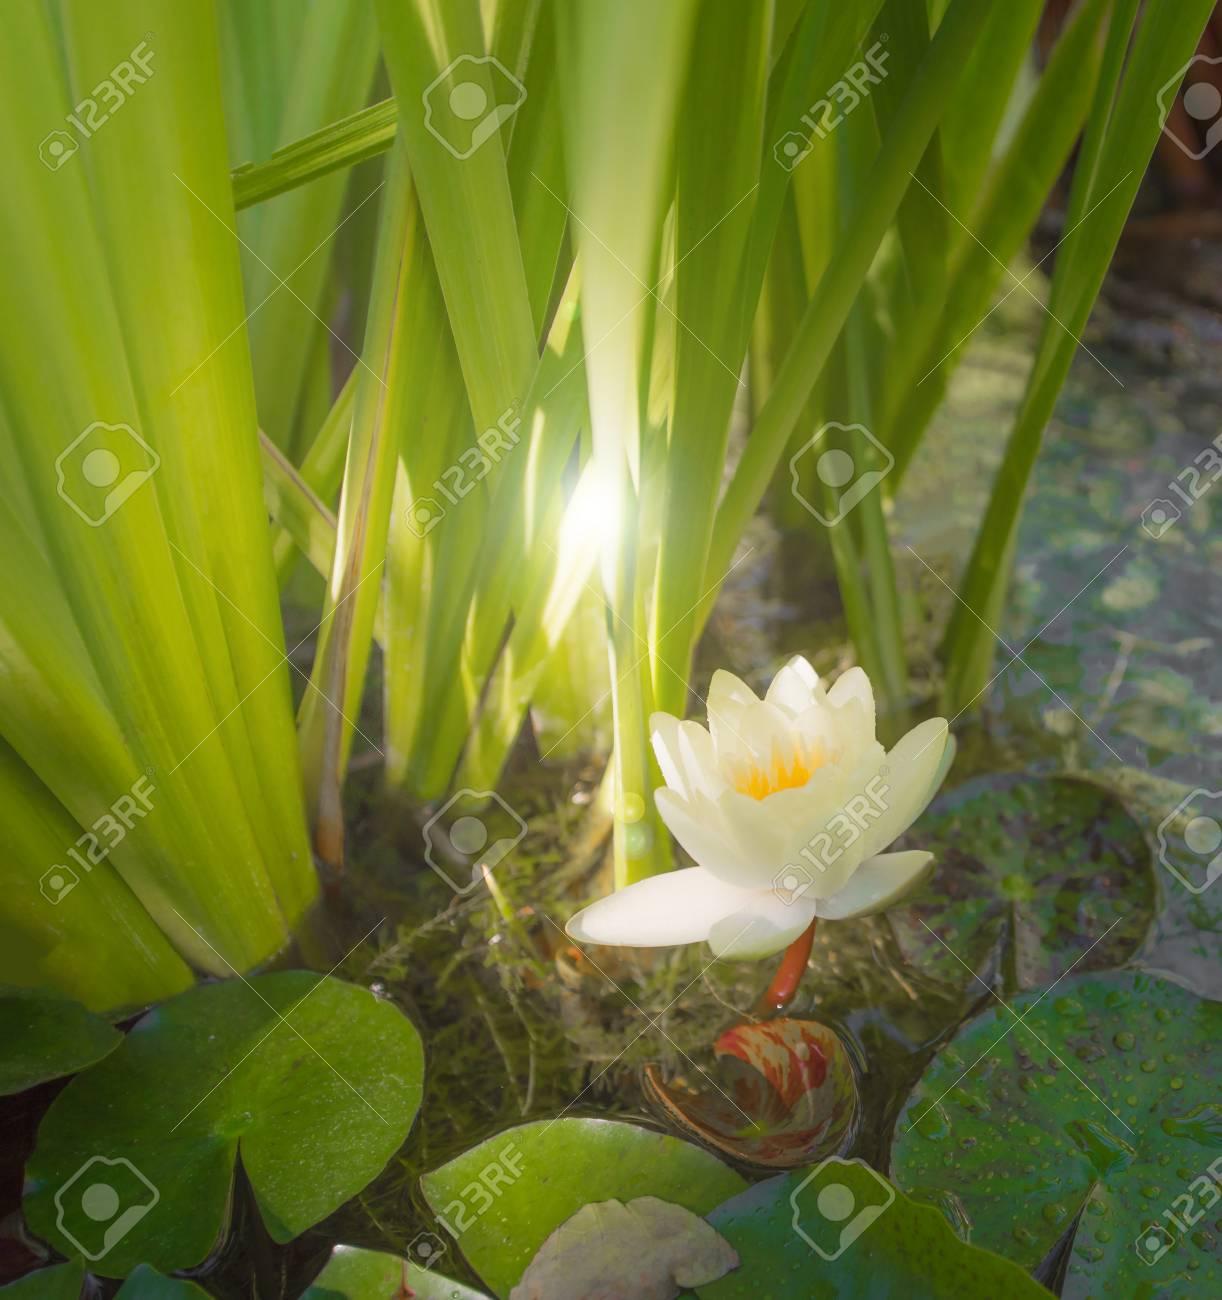 Light yellow Lotus blooming in pond - 115023917